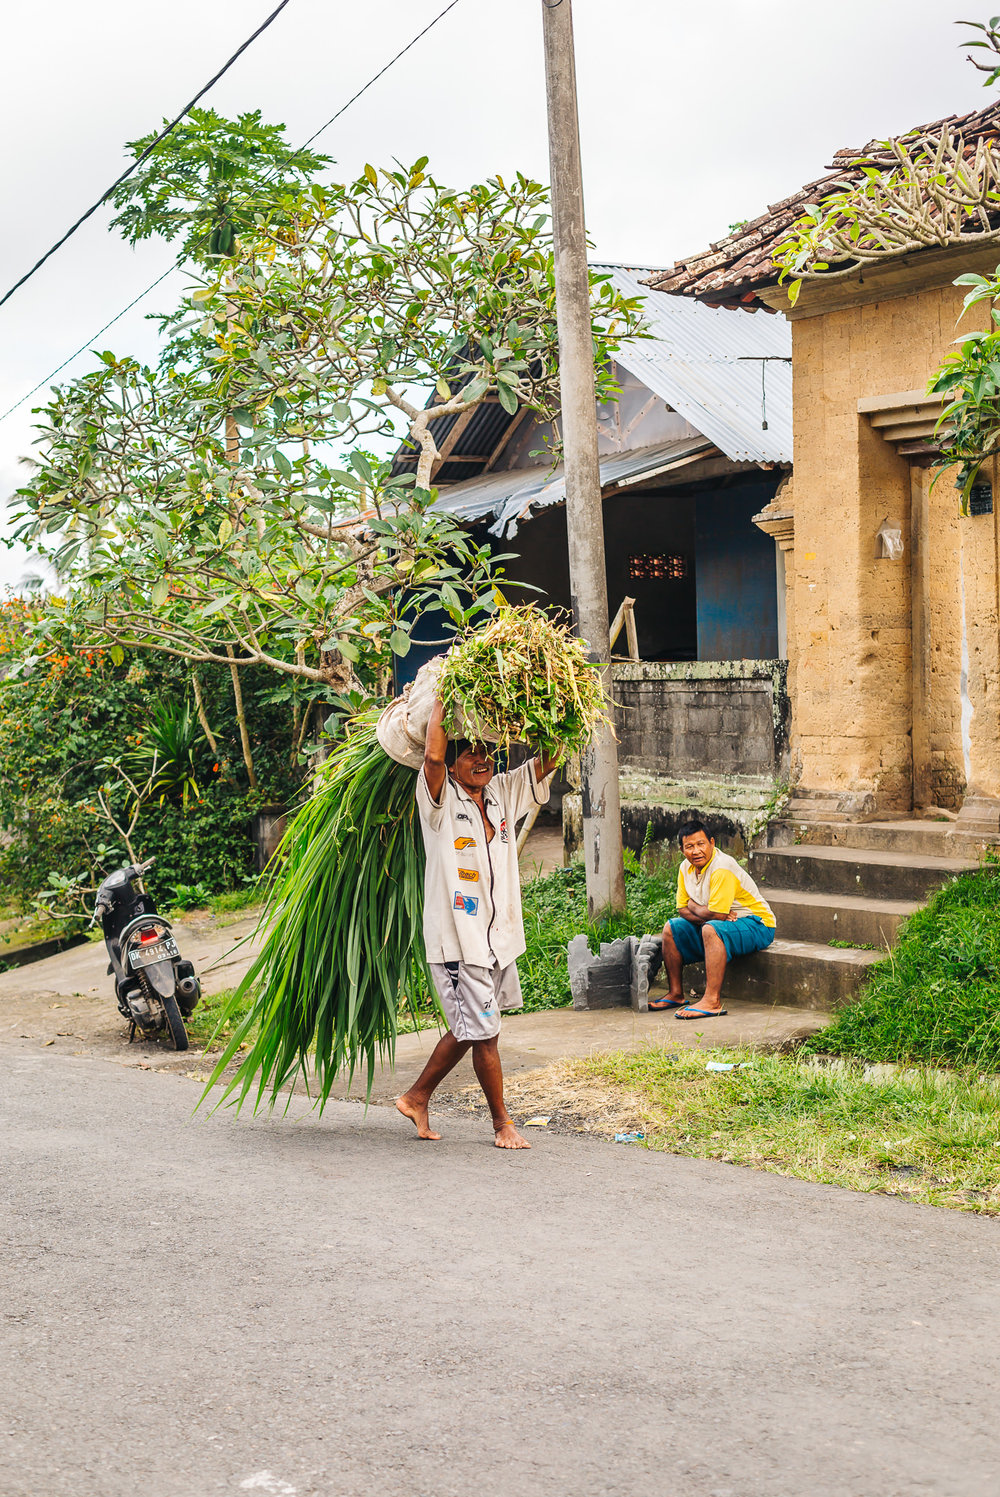 Local Balinese Farmer in Ubud